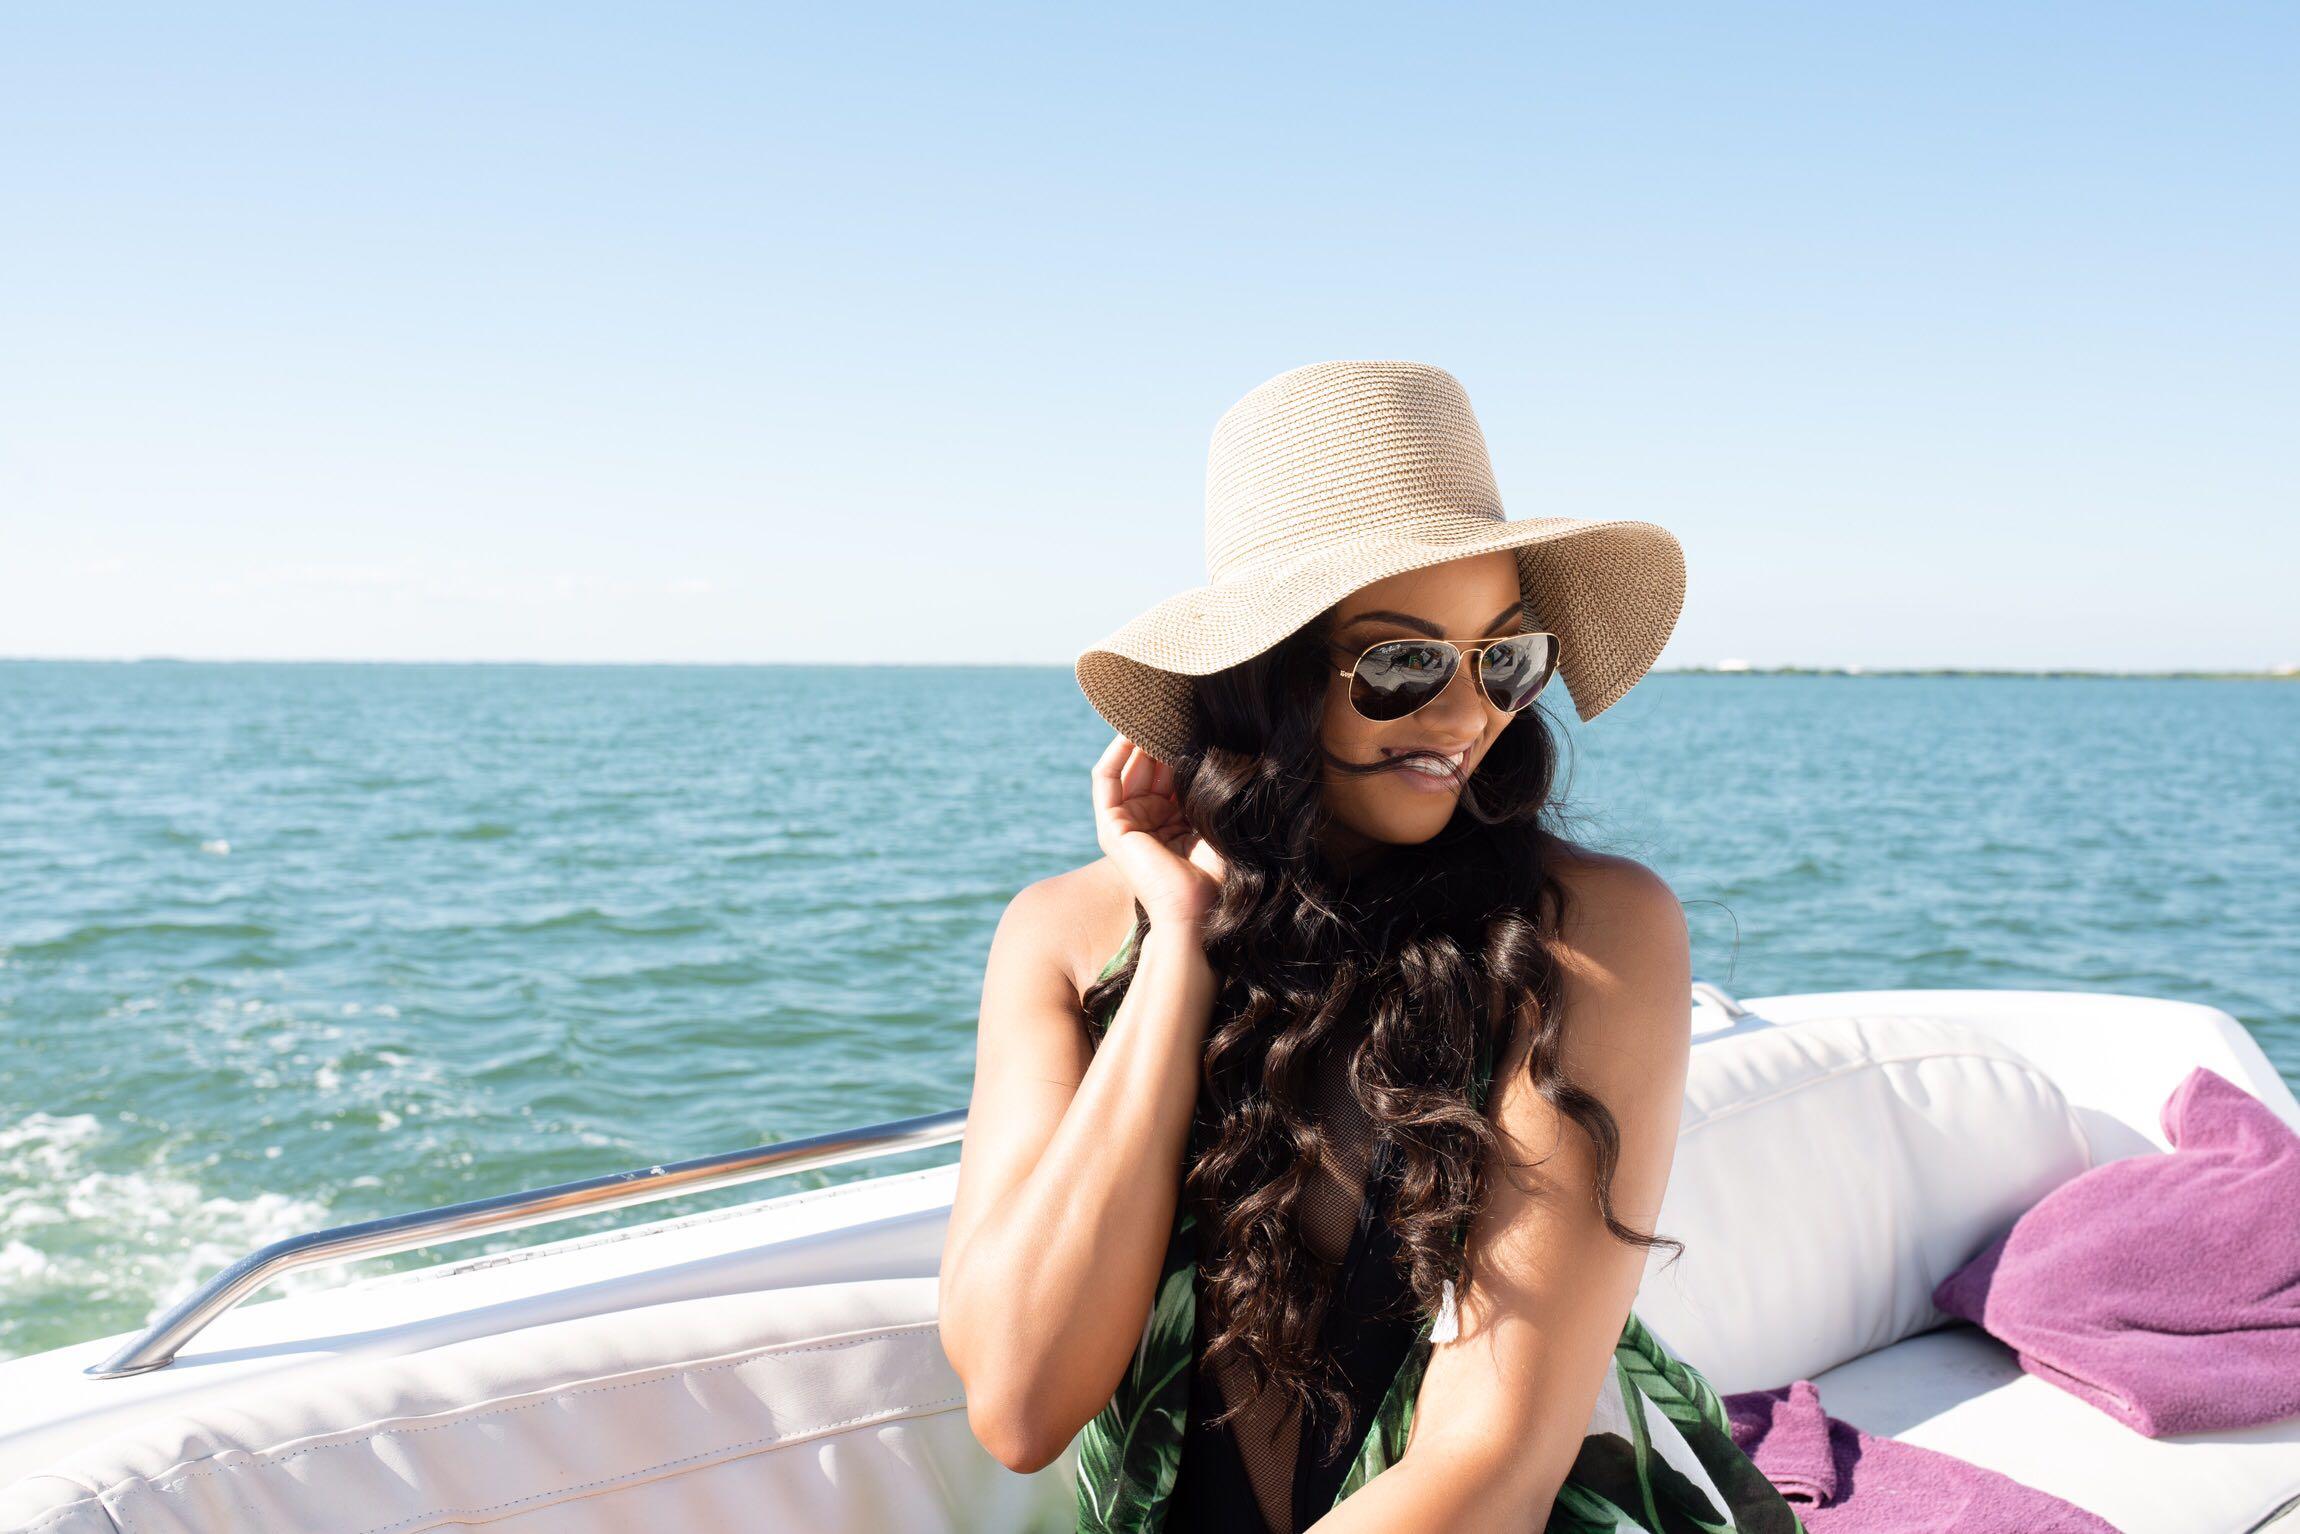 Courtnie Nichols, founder of TravelBash